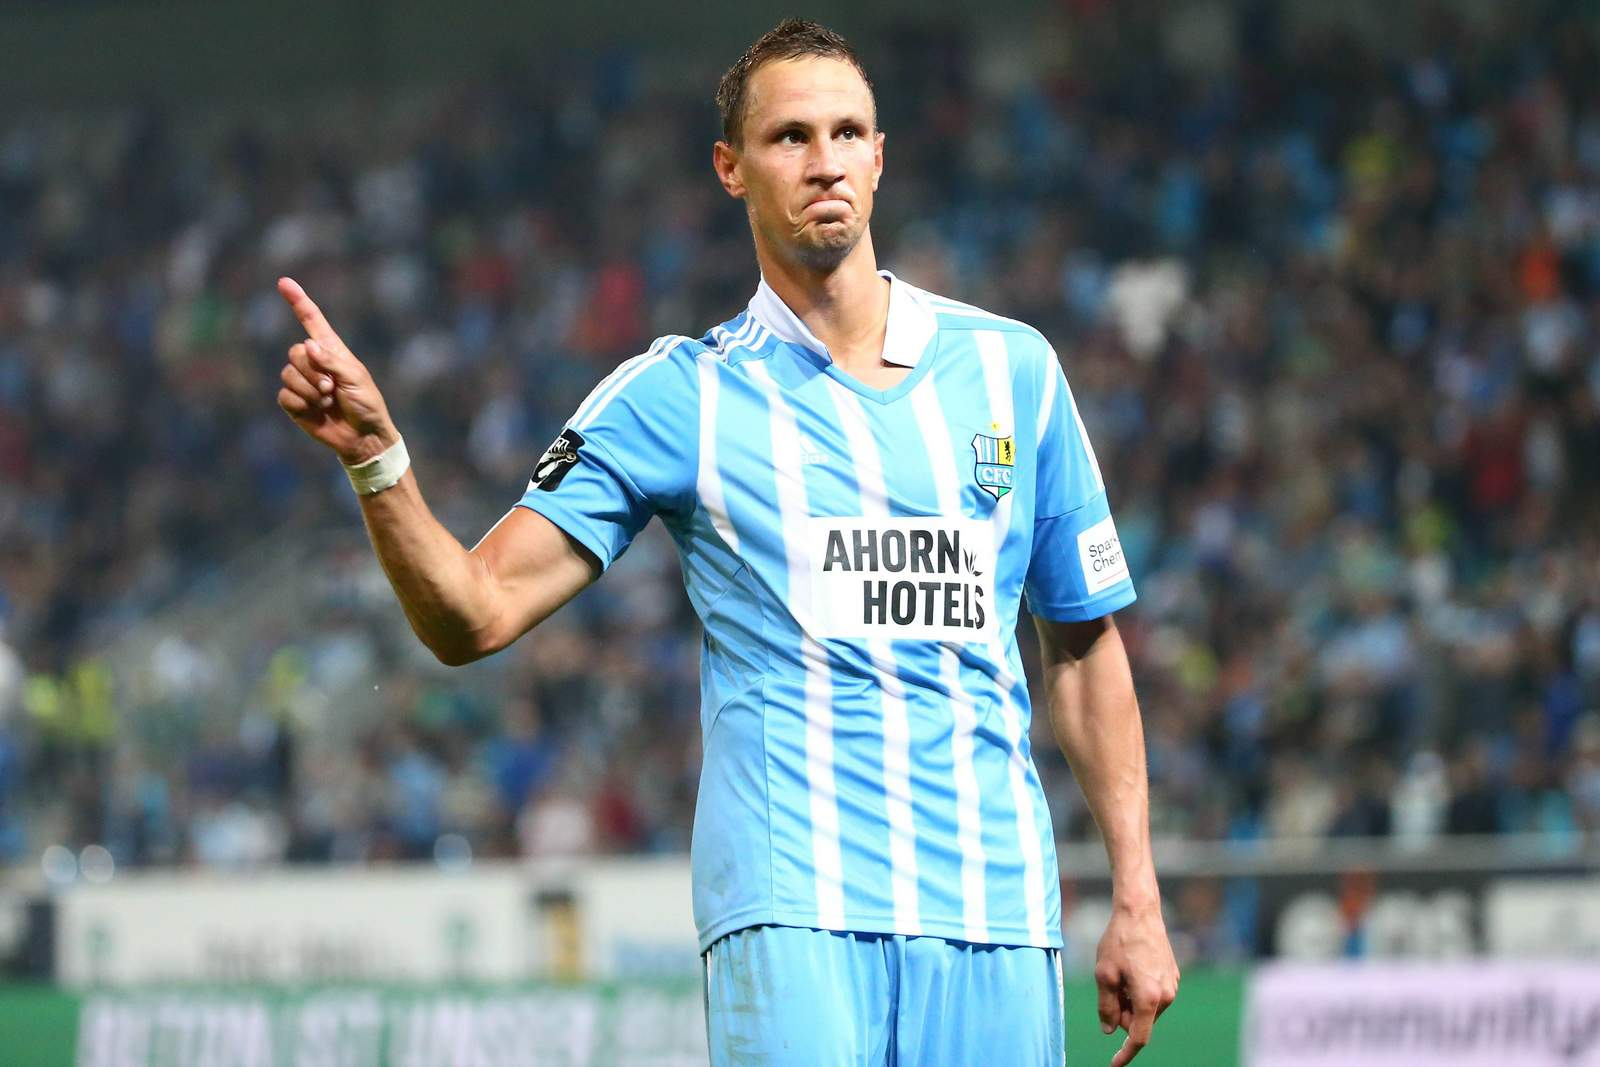 Tim Danneberg vom Chemnitzer FC